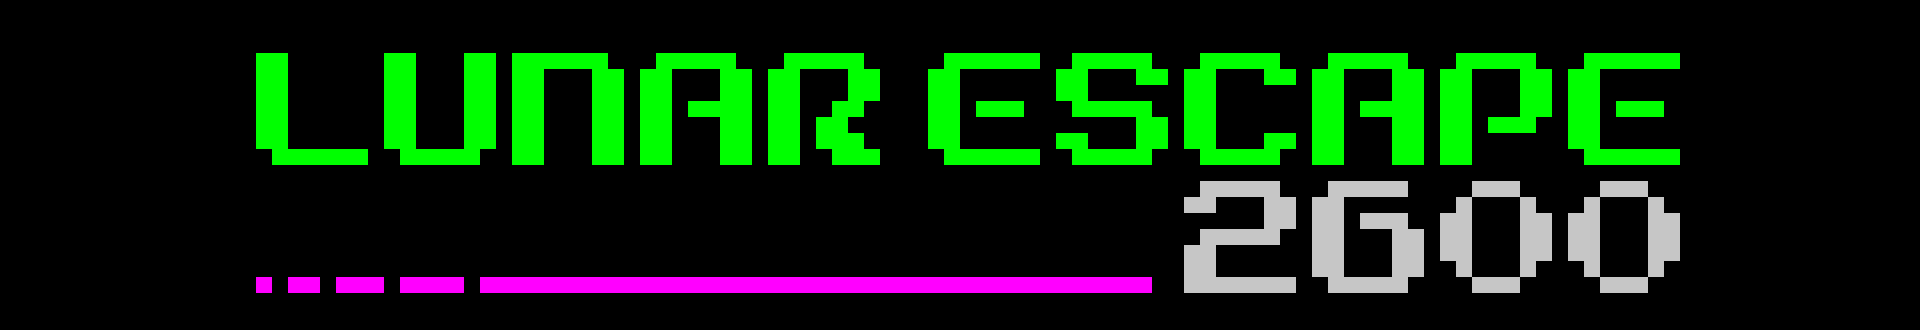 Lunar Escape 2600